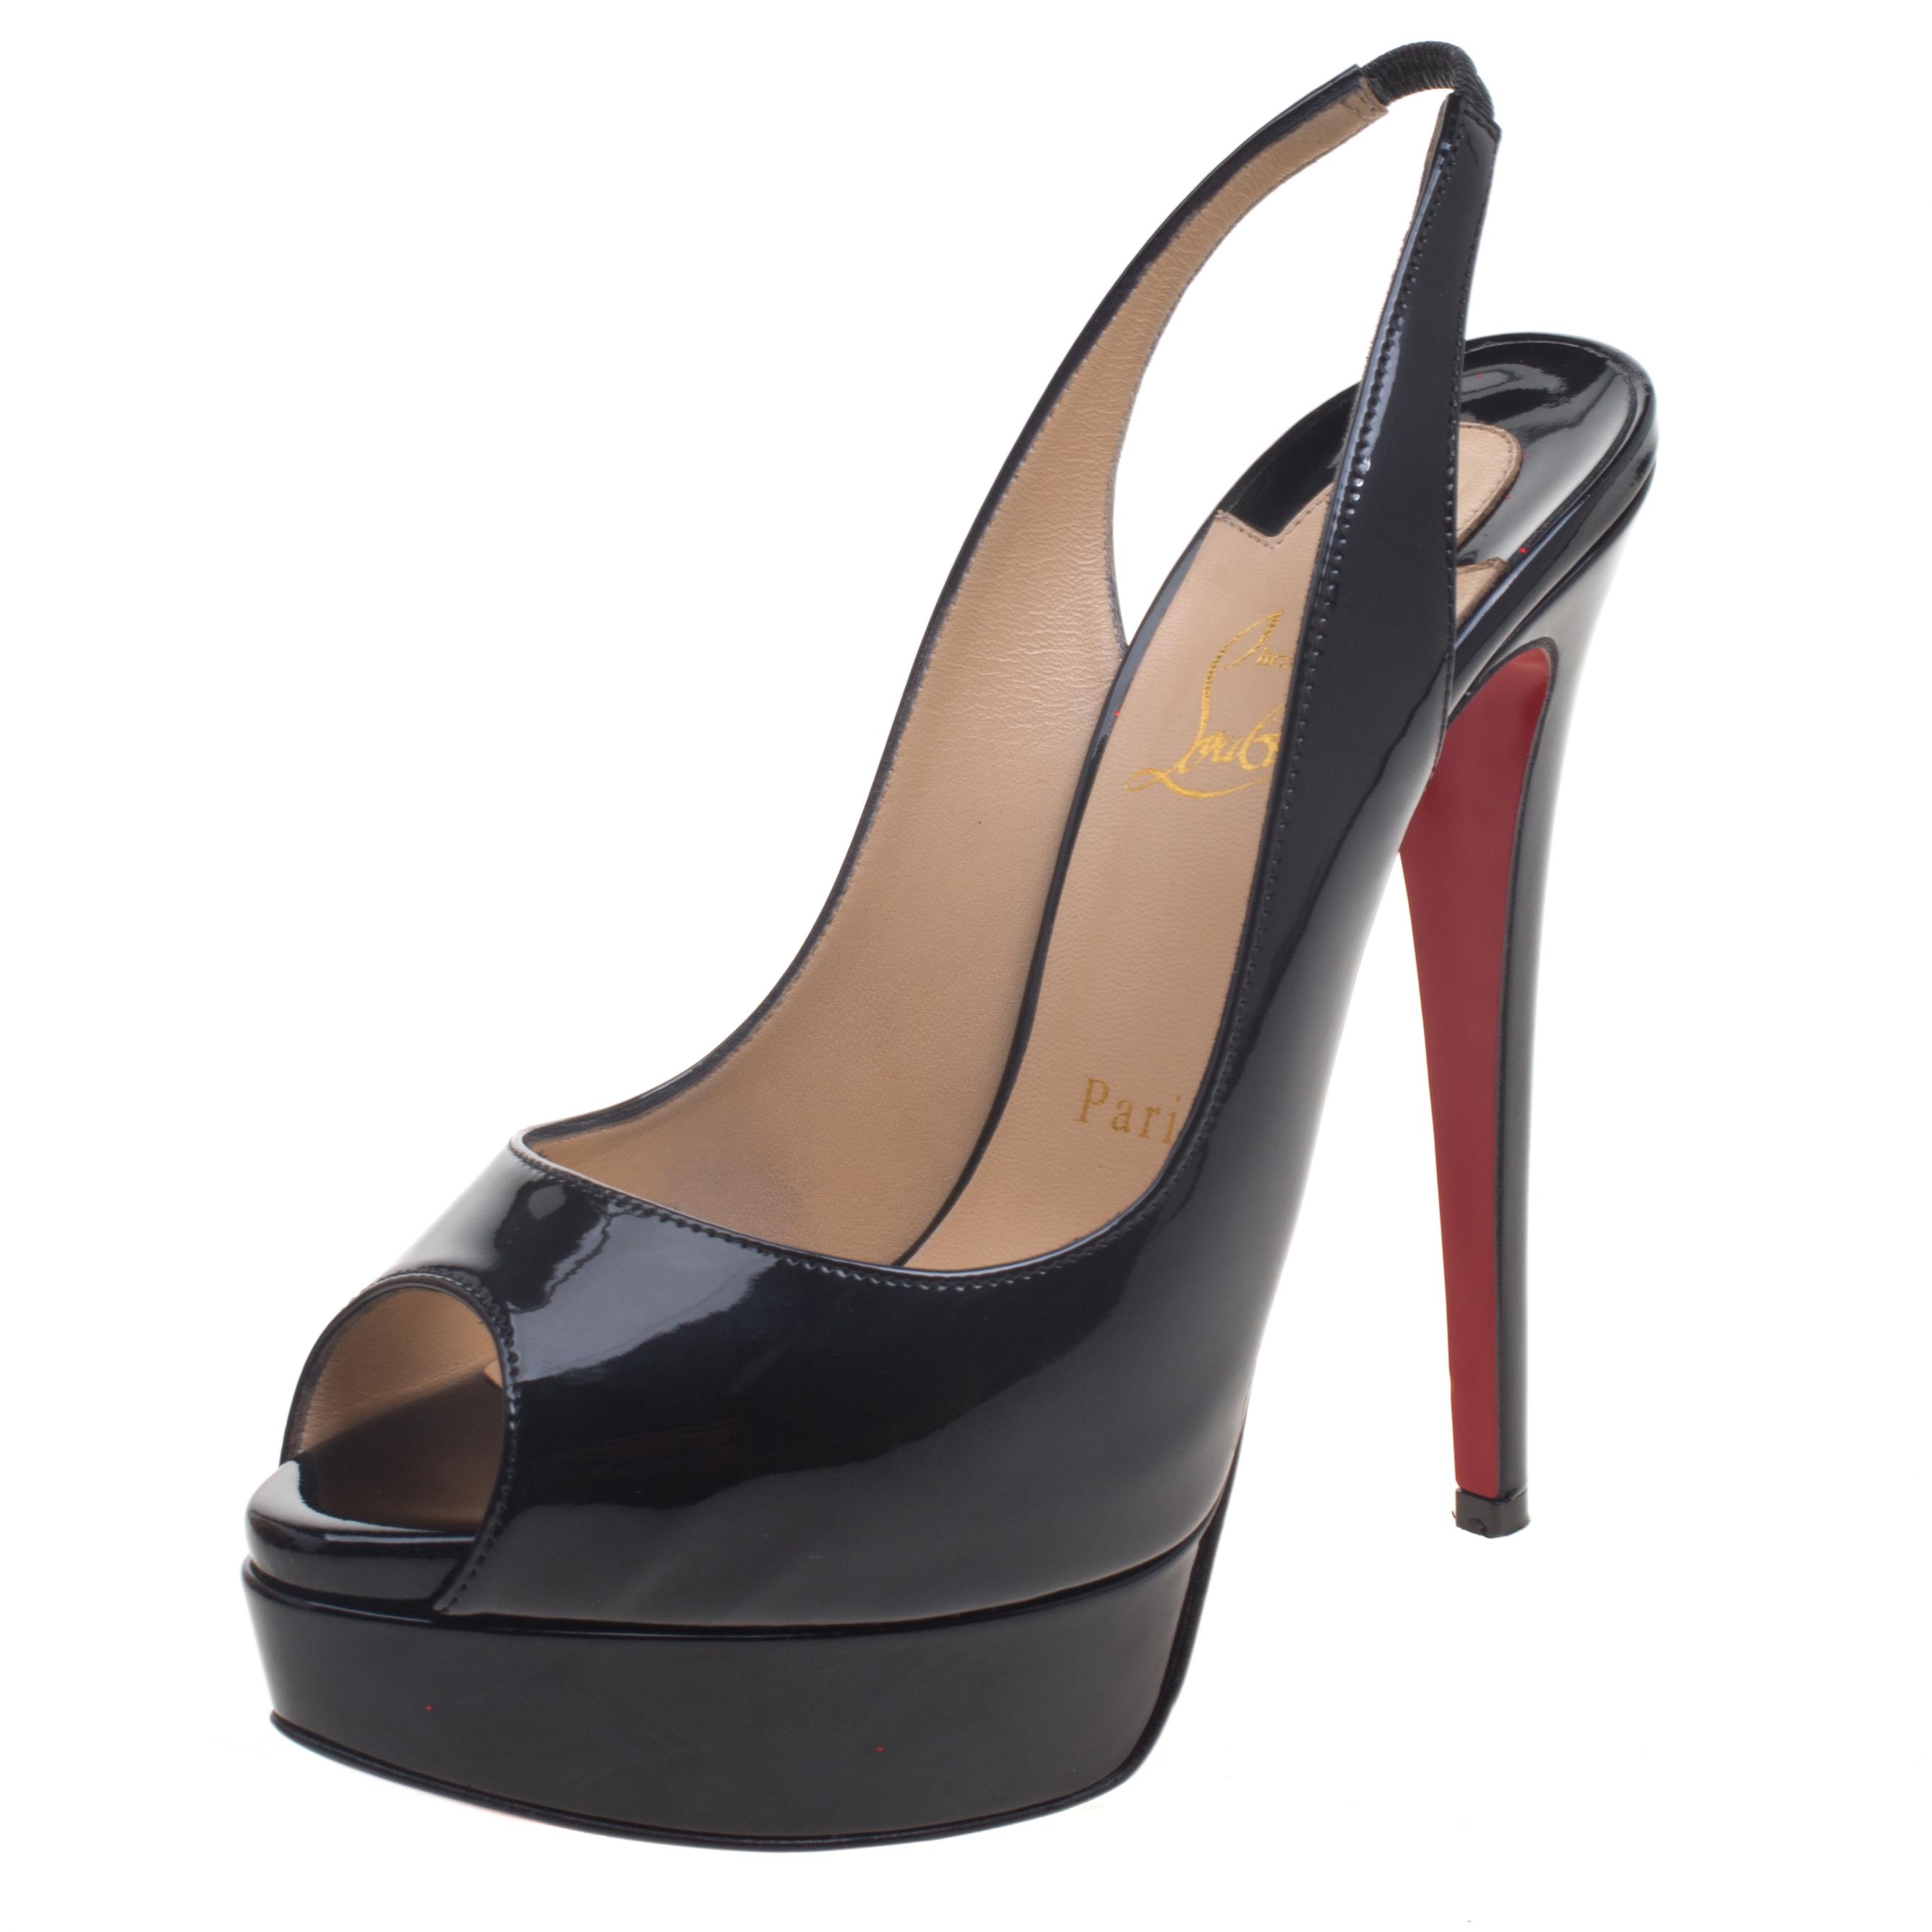 5a4849c44fef ... Christian Louboutin Black Patent Leather Lady Peep Toe Platform  Slingback Sandals Size 37.5. nextprev. prevnext